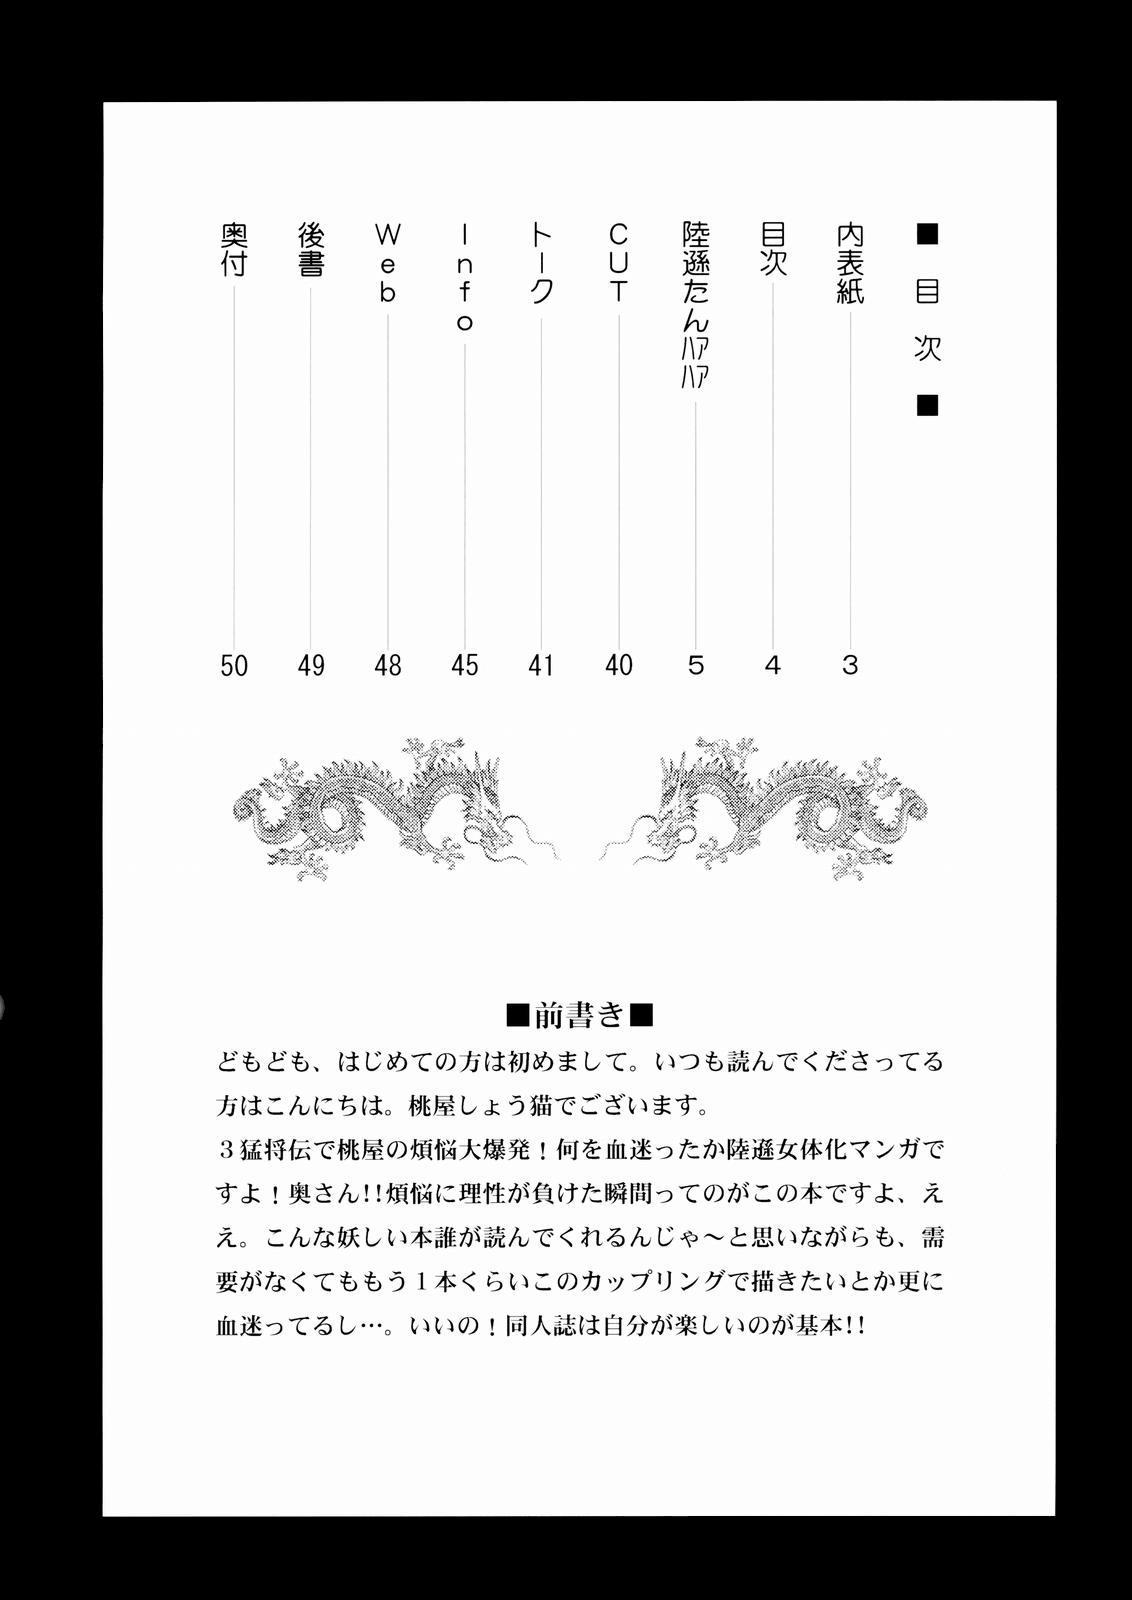 In Sangoku Musou Rikuson Gaiden | Dynasty Warriors: Rikuson's Story 2